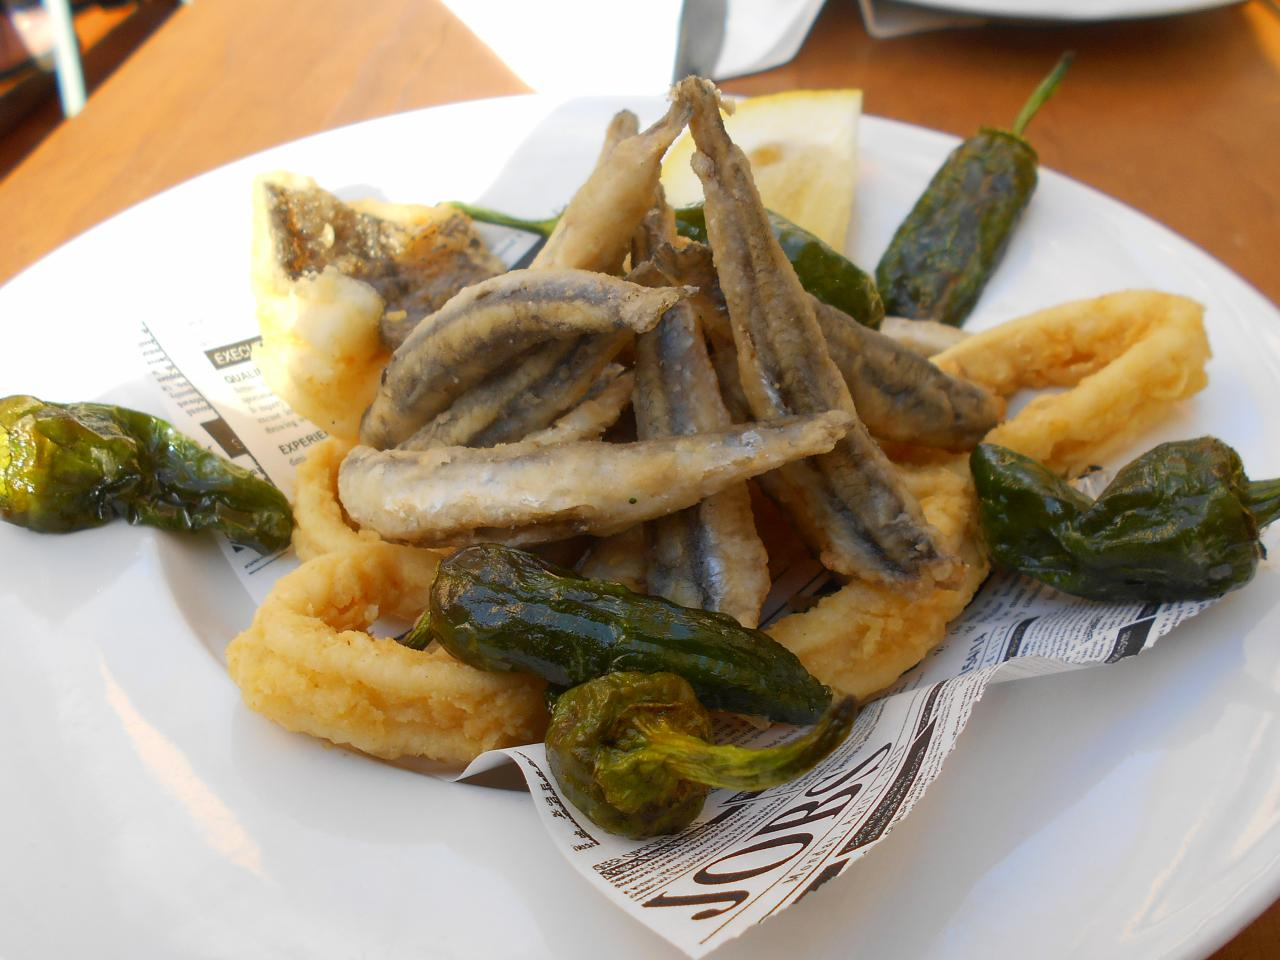 The calamares and deep-fried boquerones